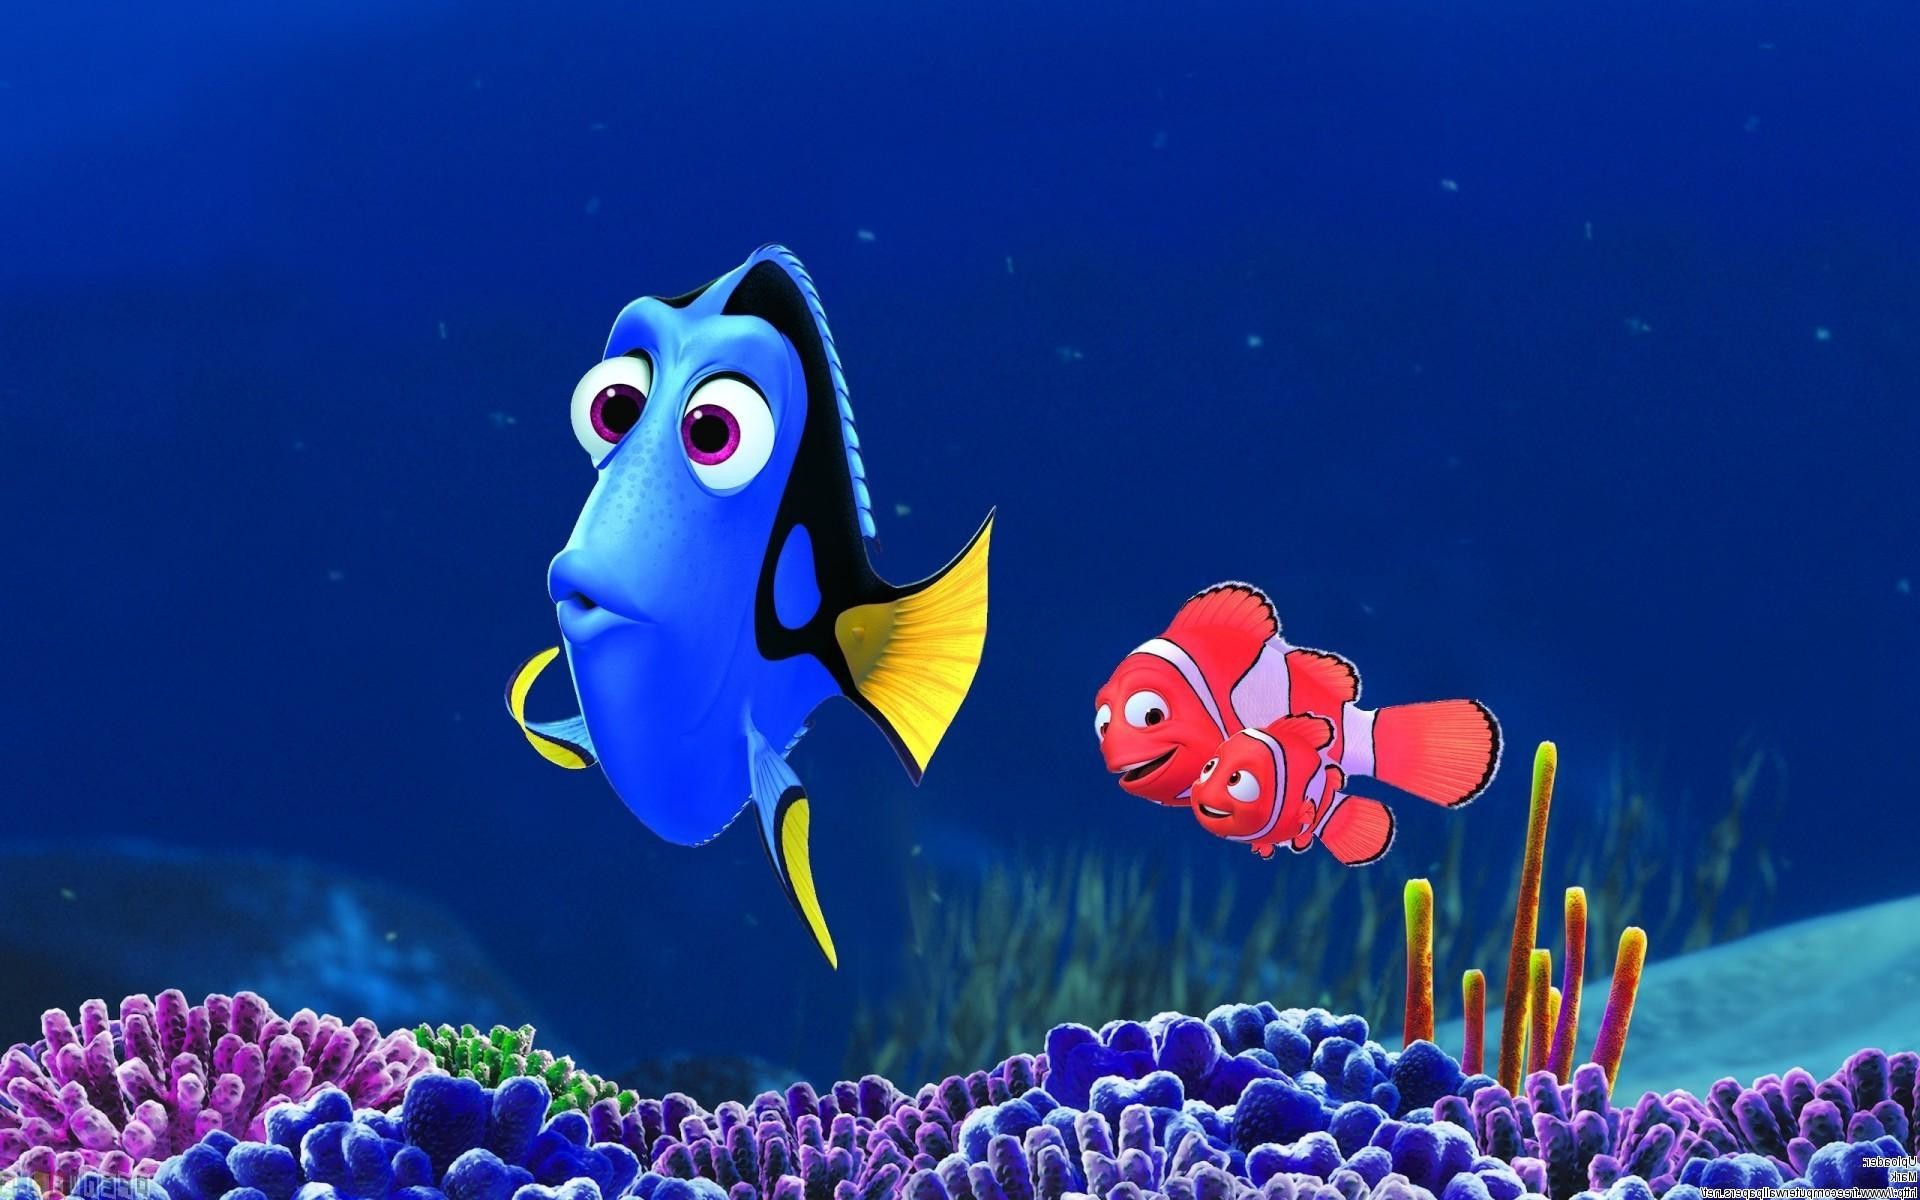 Finding Nemo D Animasi Hd Wallpaper: Finding Dory Wallpapers ·①